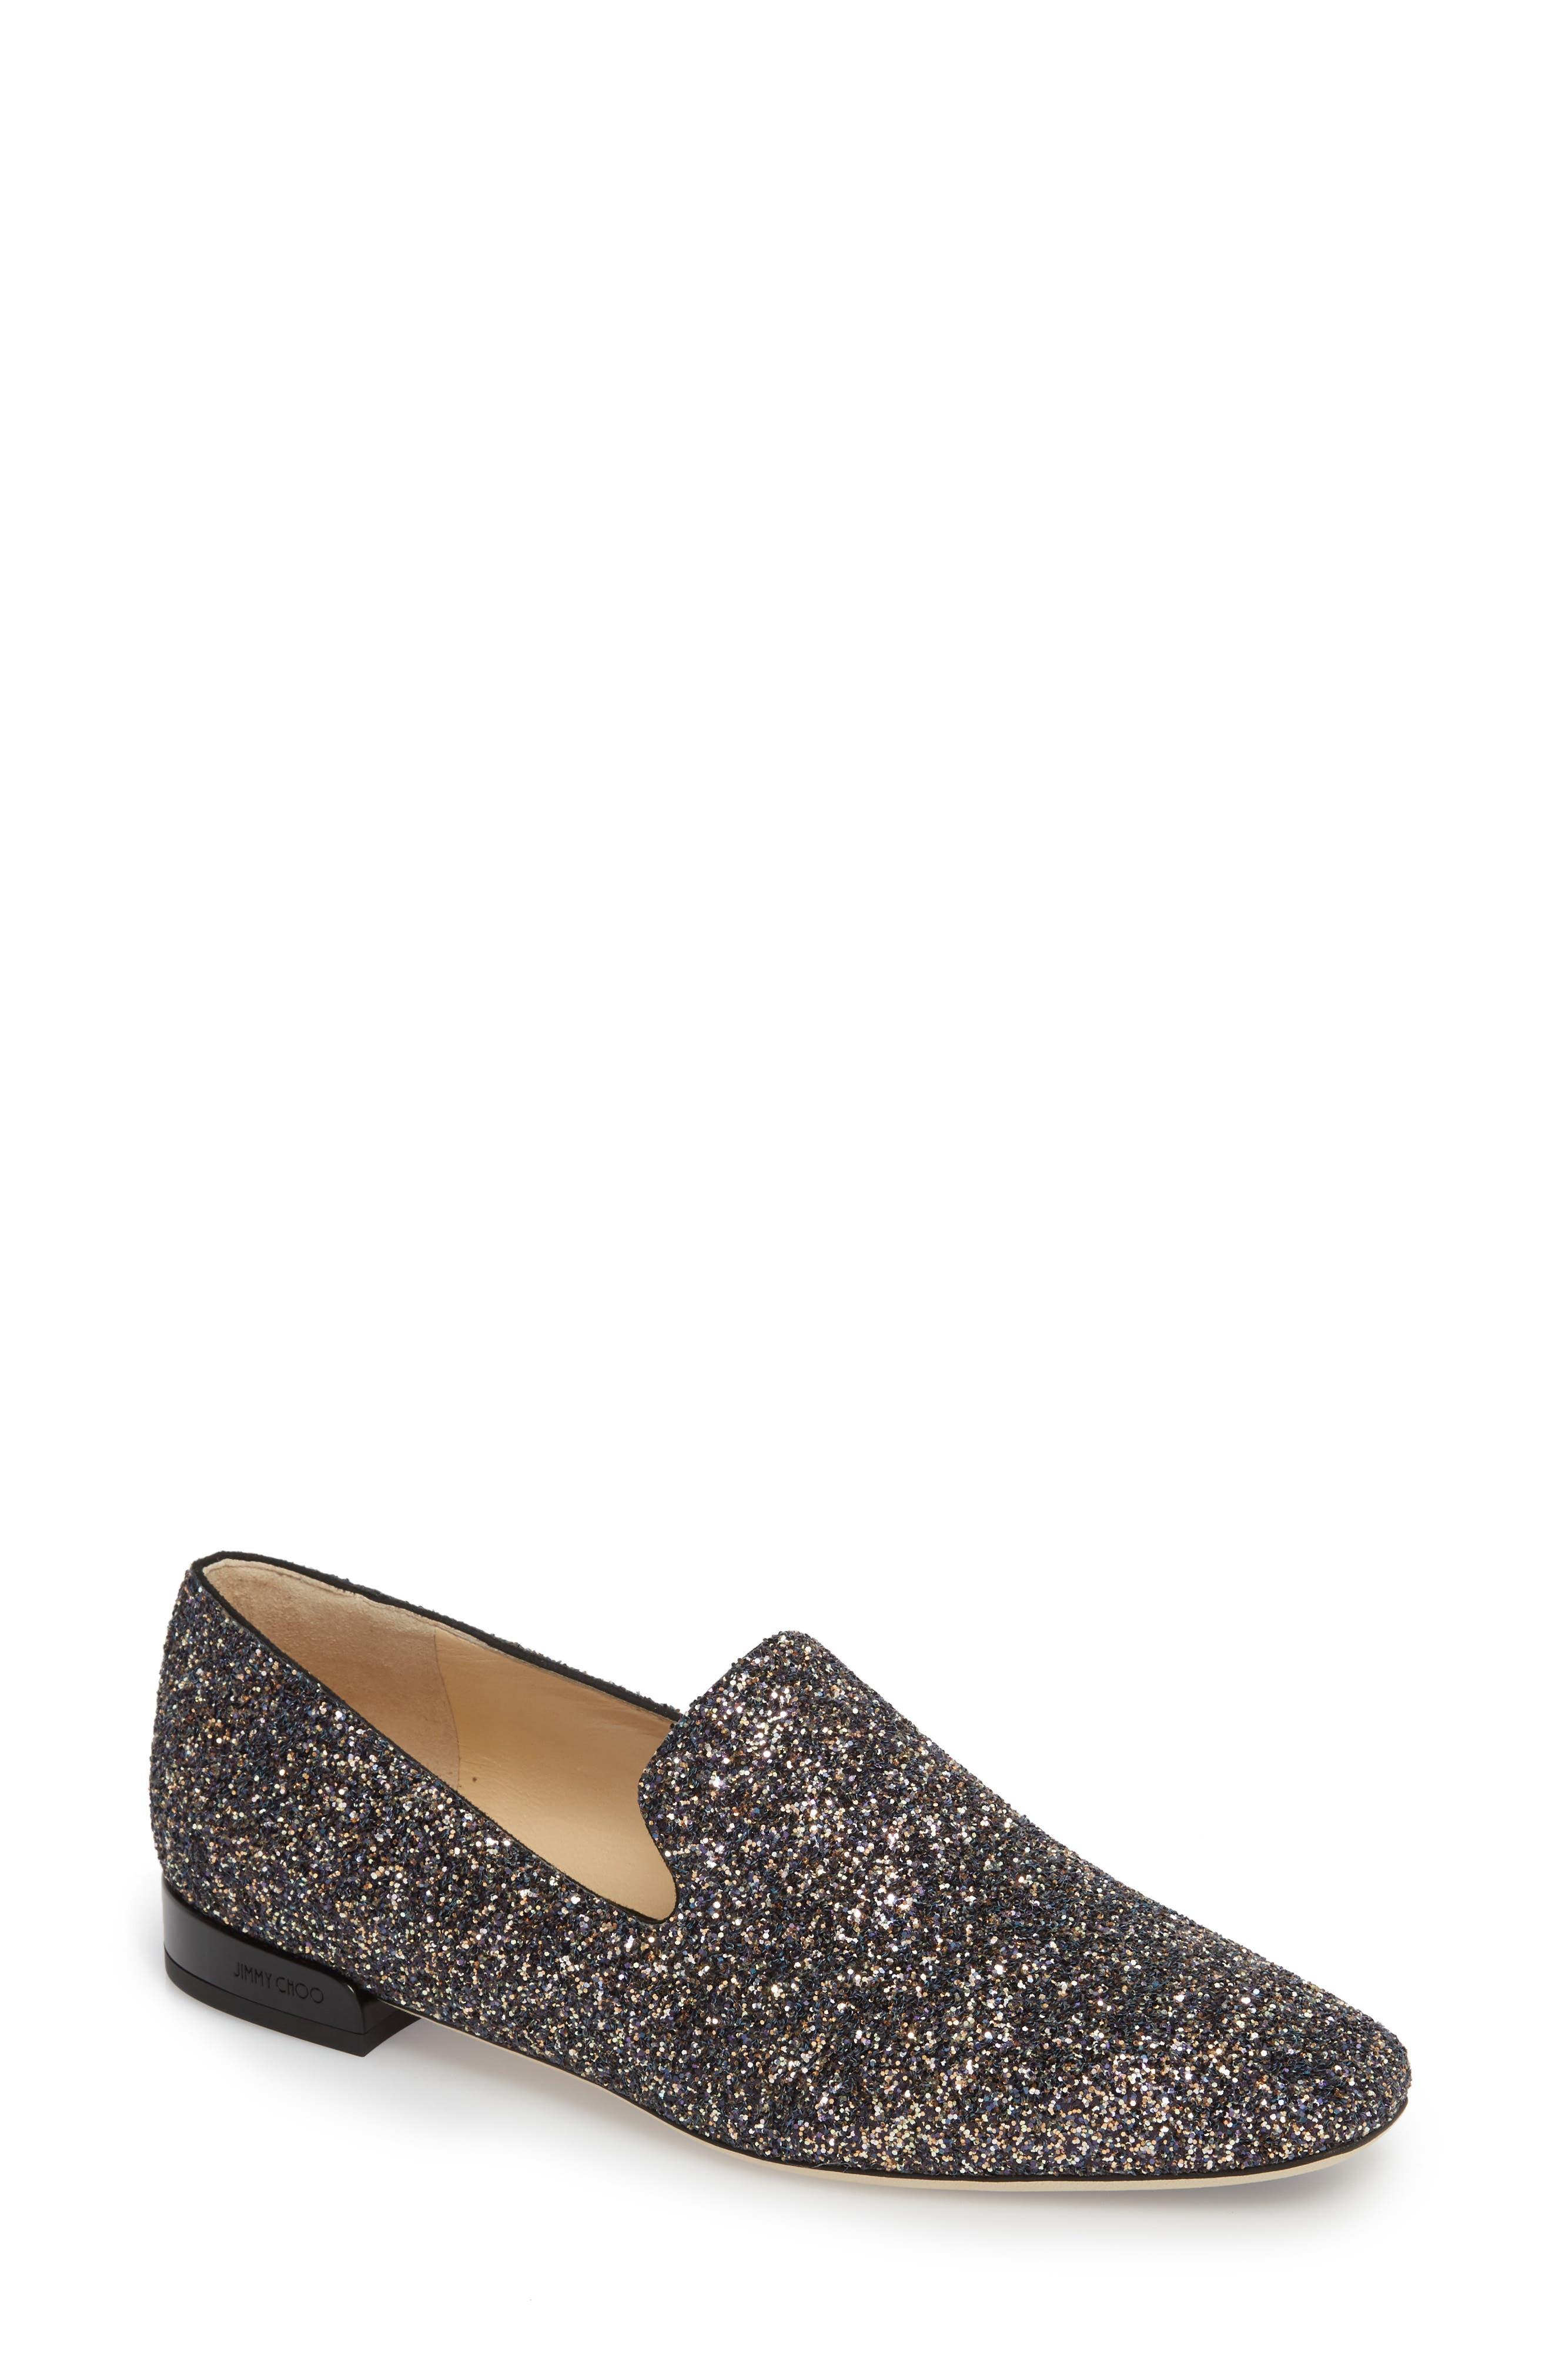 Jimmy Choo Jaida Glitter Loafer (Women)